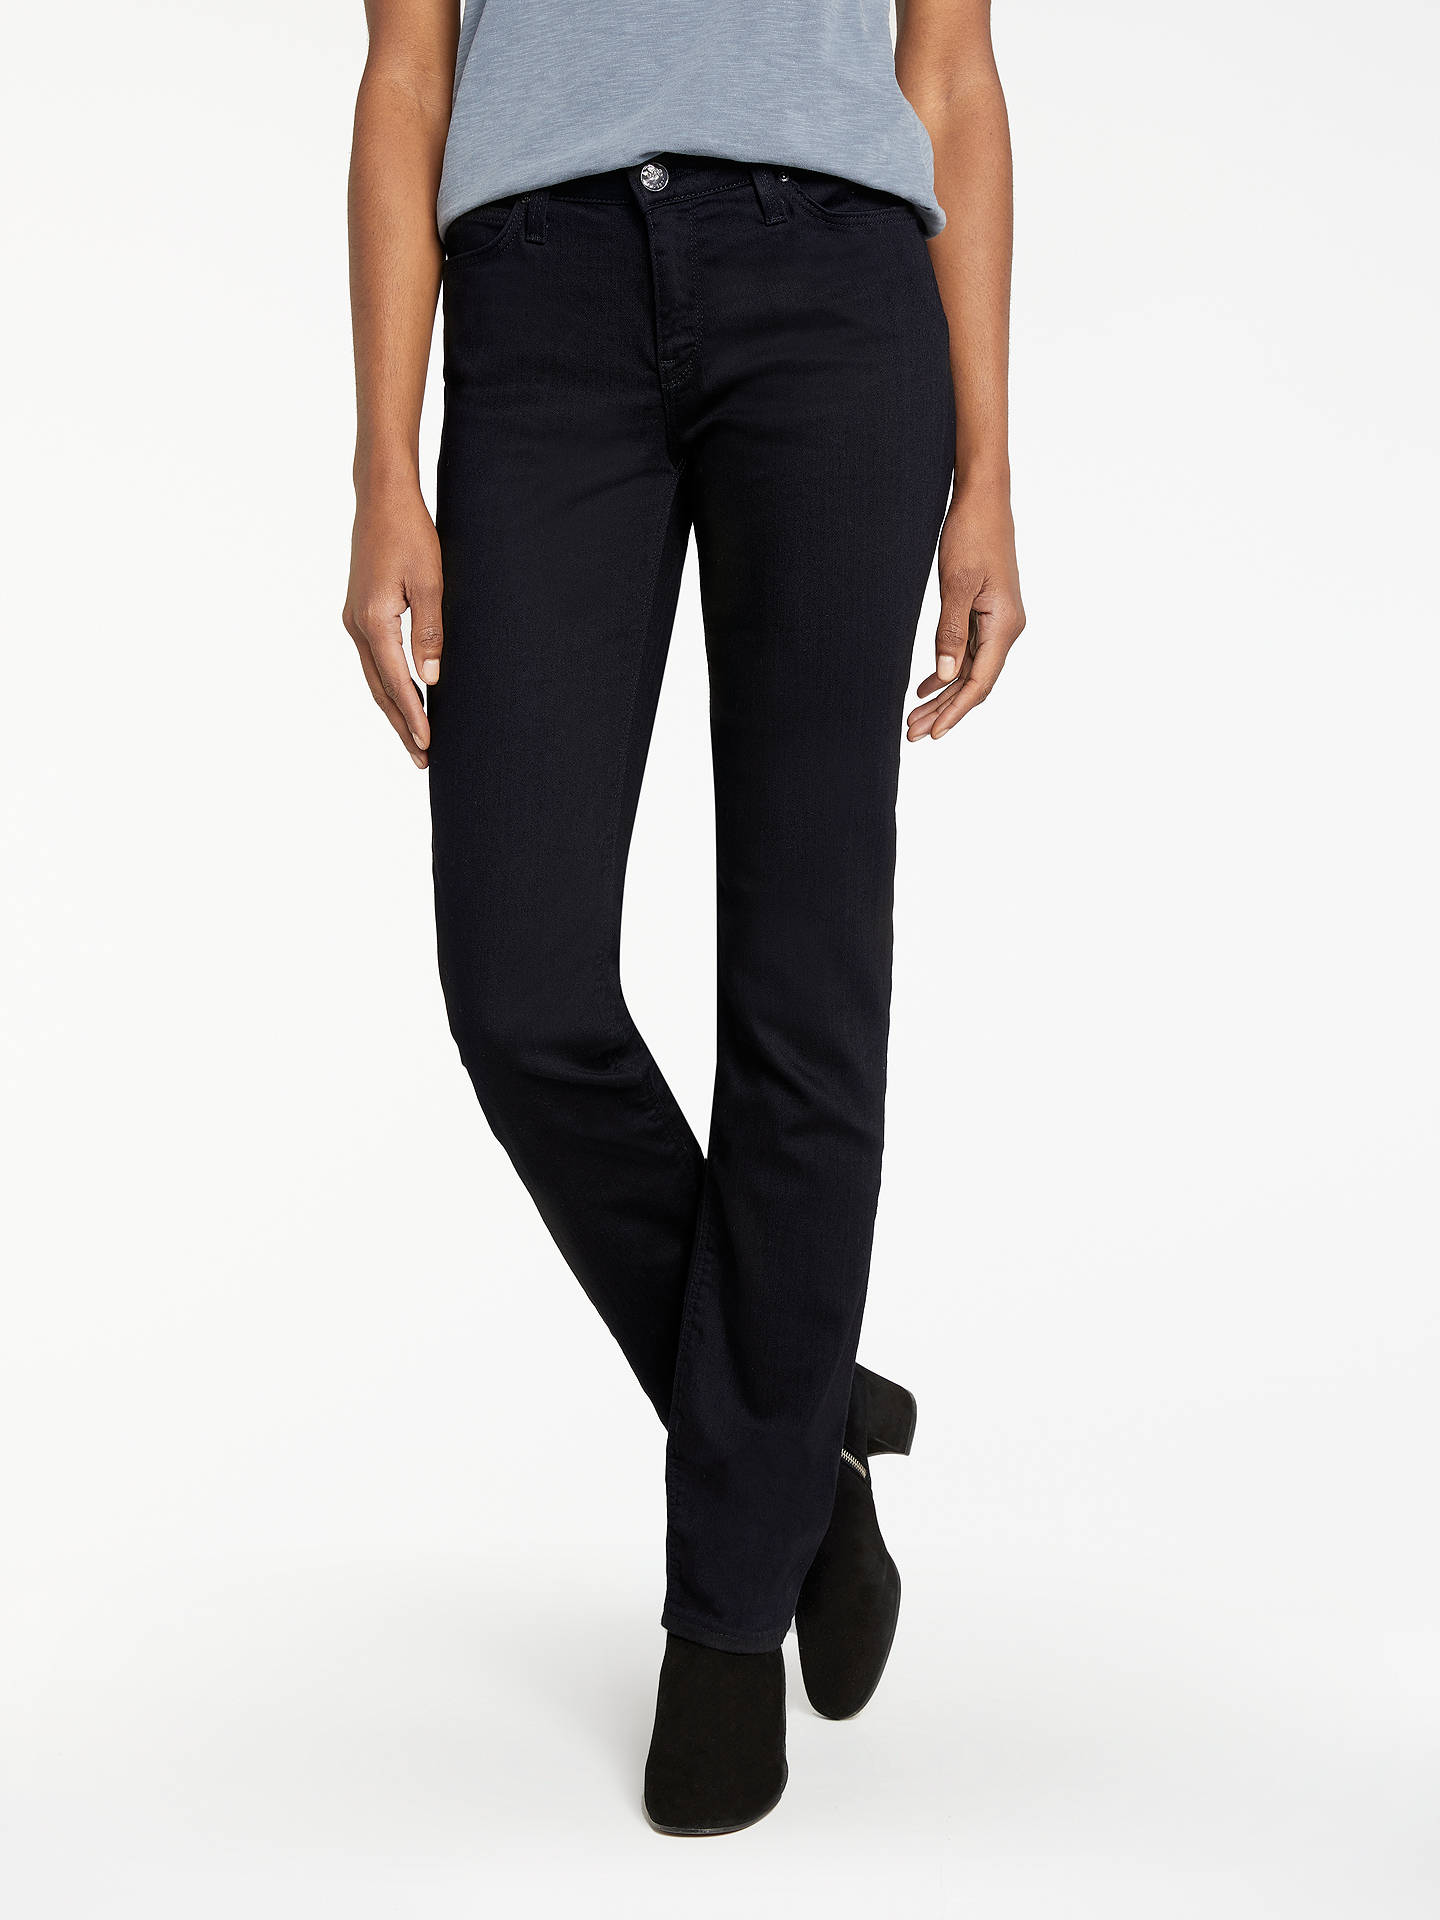 9e177868 Buy Lee Marion Regular Straight Leg Jeans, Black Rinse, W27/L31 Online at  ...